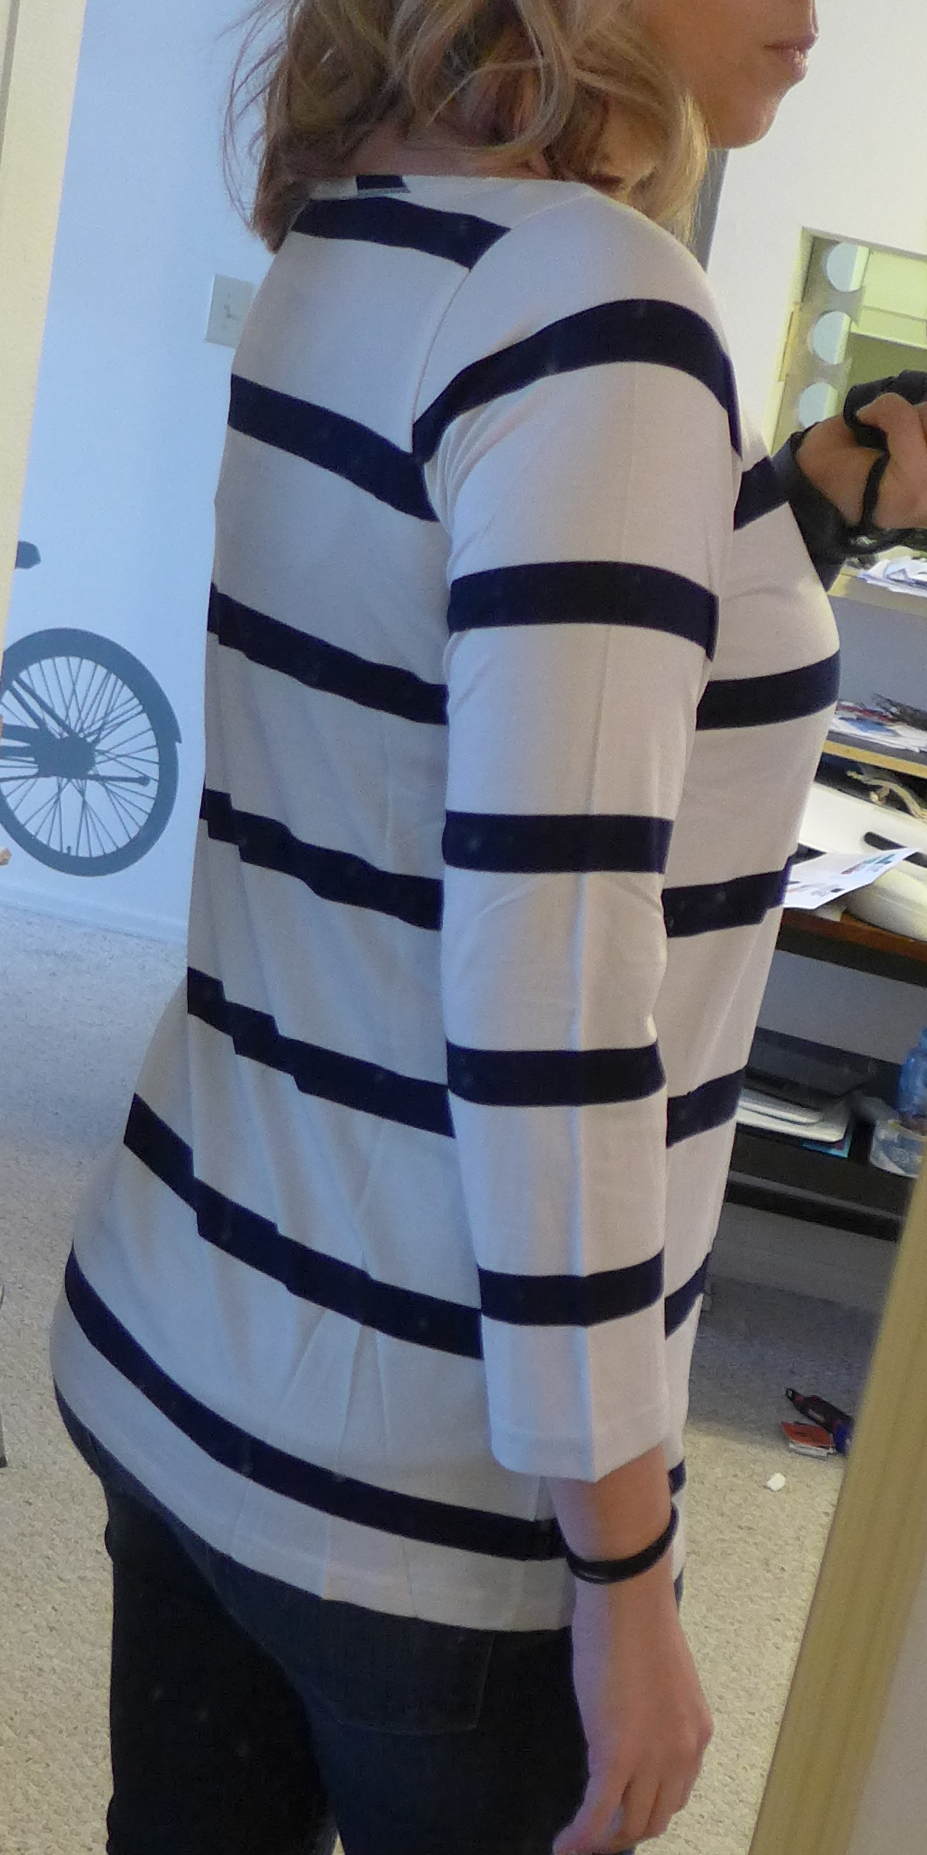 Stitch Fix Toss Vita Boat Neck Stripe Knit Shirt - Monika side view - Stitch Fix